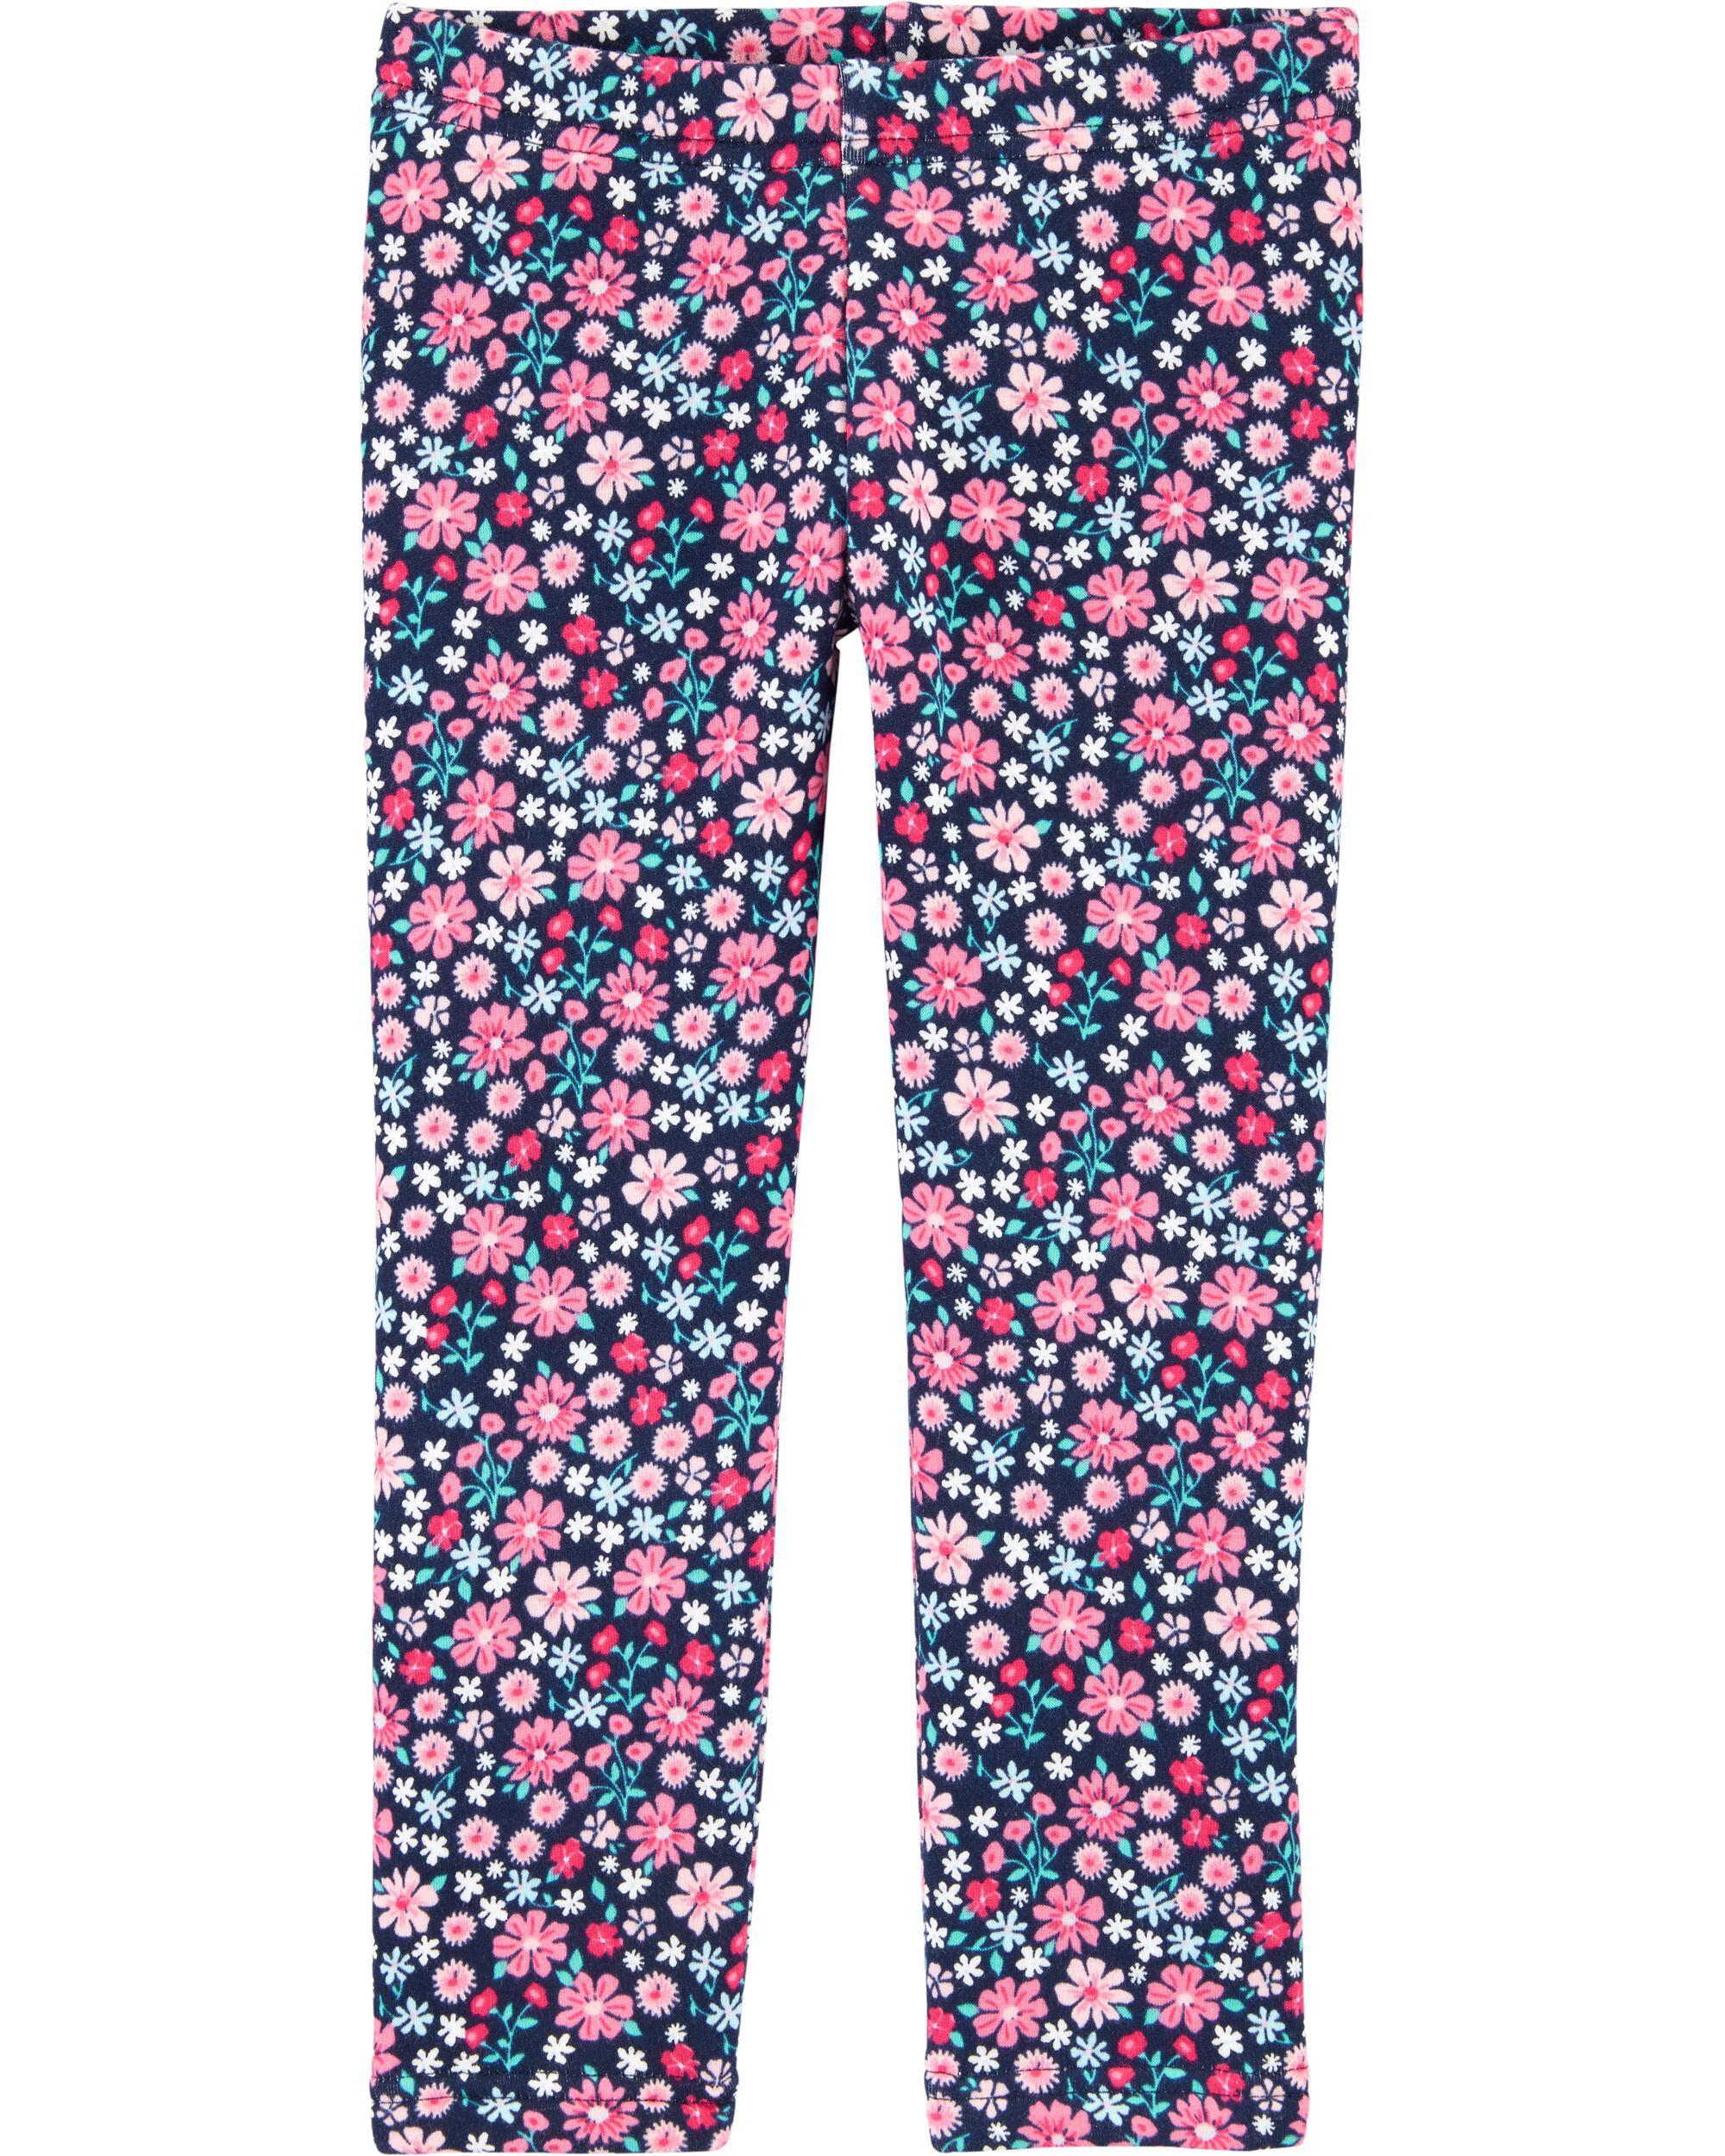 *Clearance*  Floral Cozy Fleece Leggings